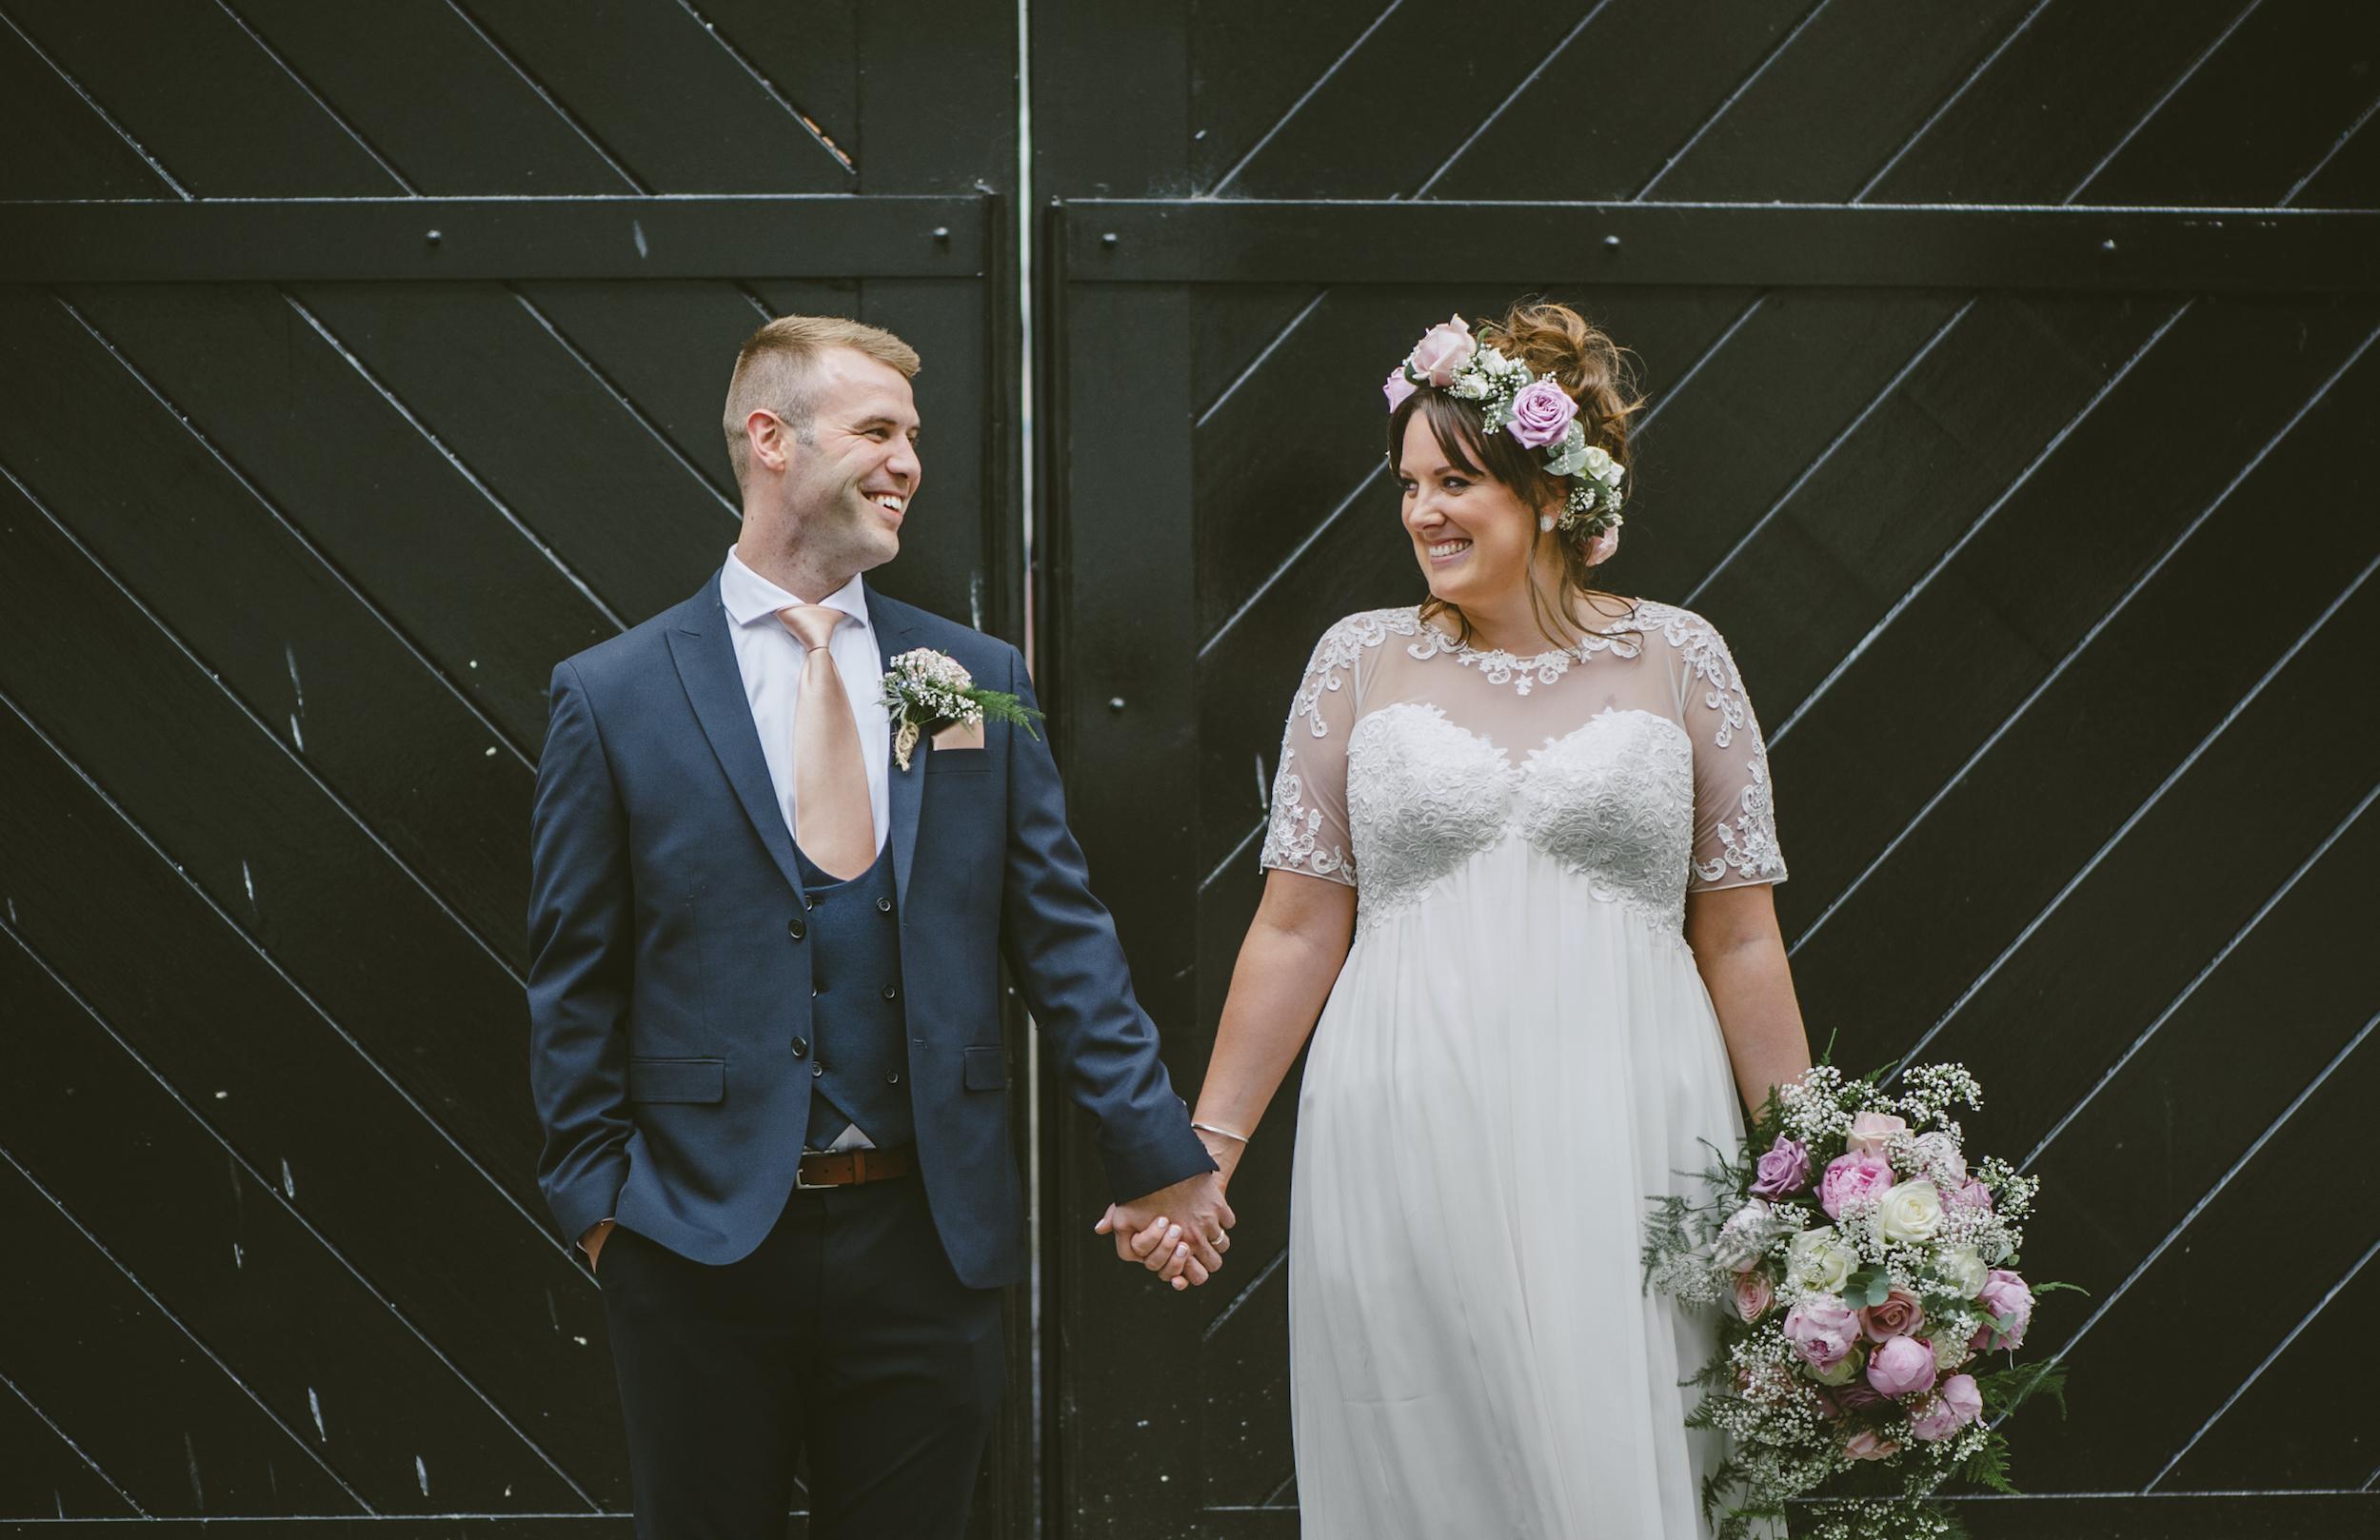 Francis_meaney_photography_merchant_hotel_wedding_belfast_inspire_weddings_8.jpeg